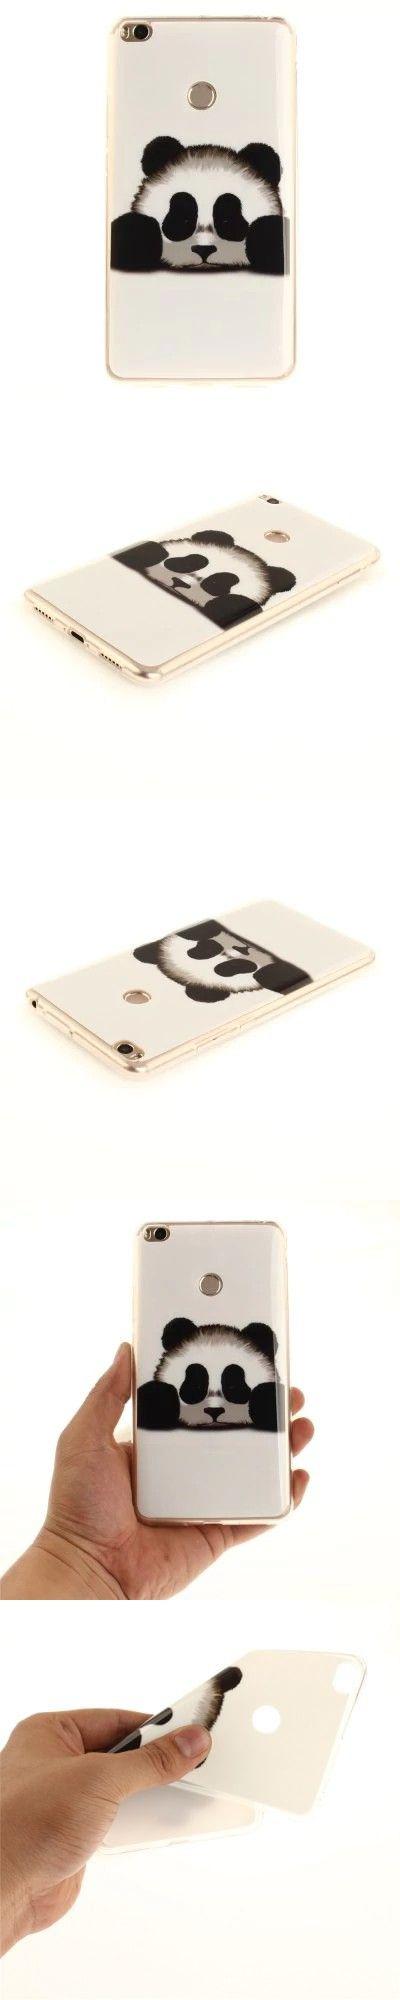 Panda Soft Clear IMD TPU Phone Casing Mobile Smartphone Cover Shell Case for Xiaomi Mi Max 2 -$2.74